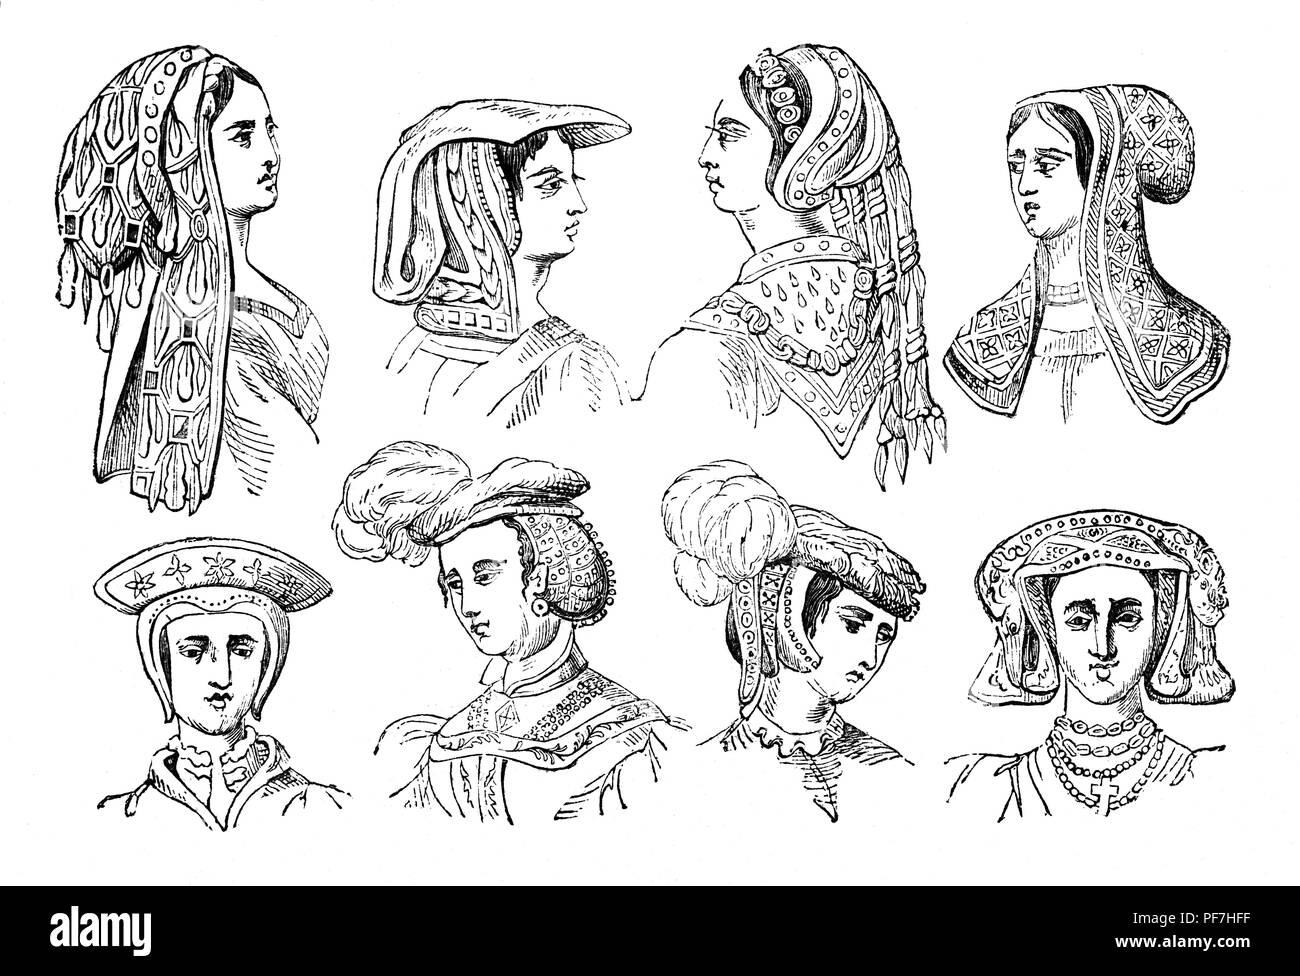 Fashion: 16th Century Women's head dresses. - Stock Image